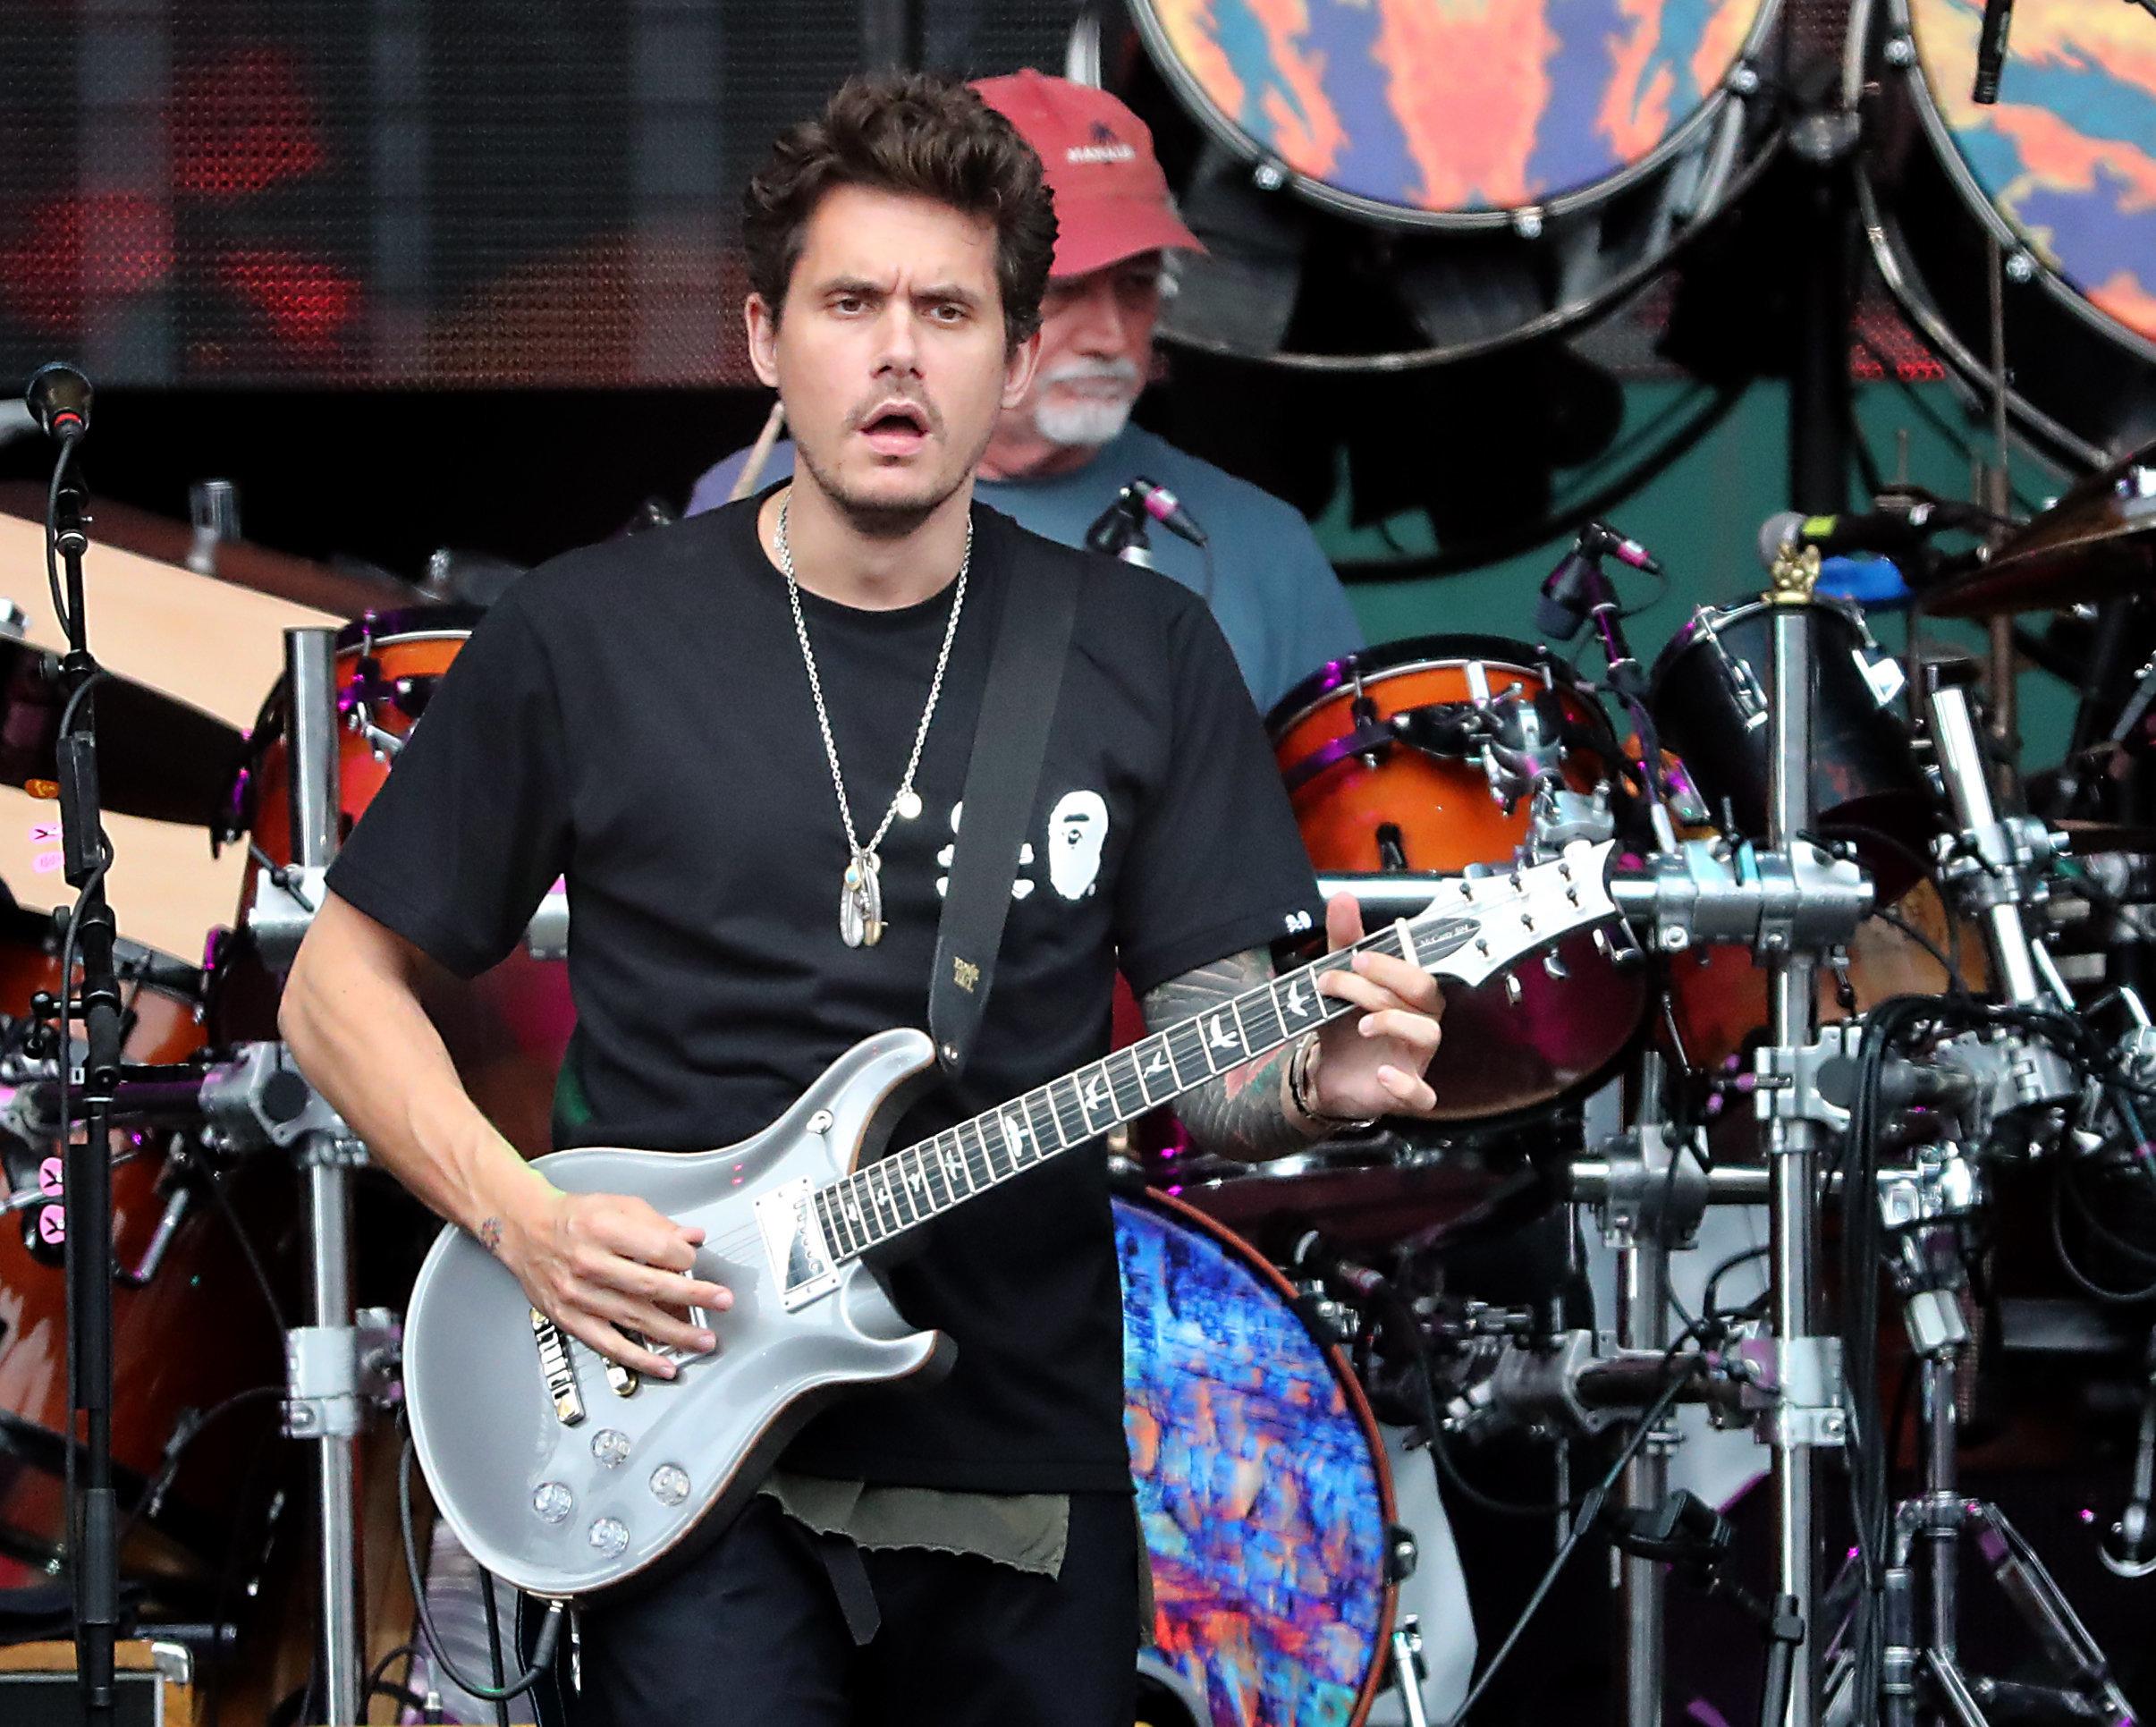 John Mayer Responds To Ex Katy Perry's Sex